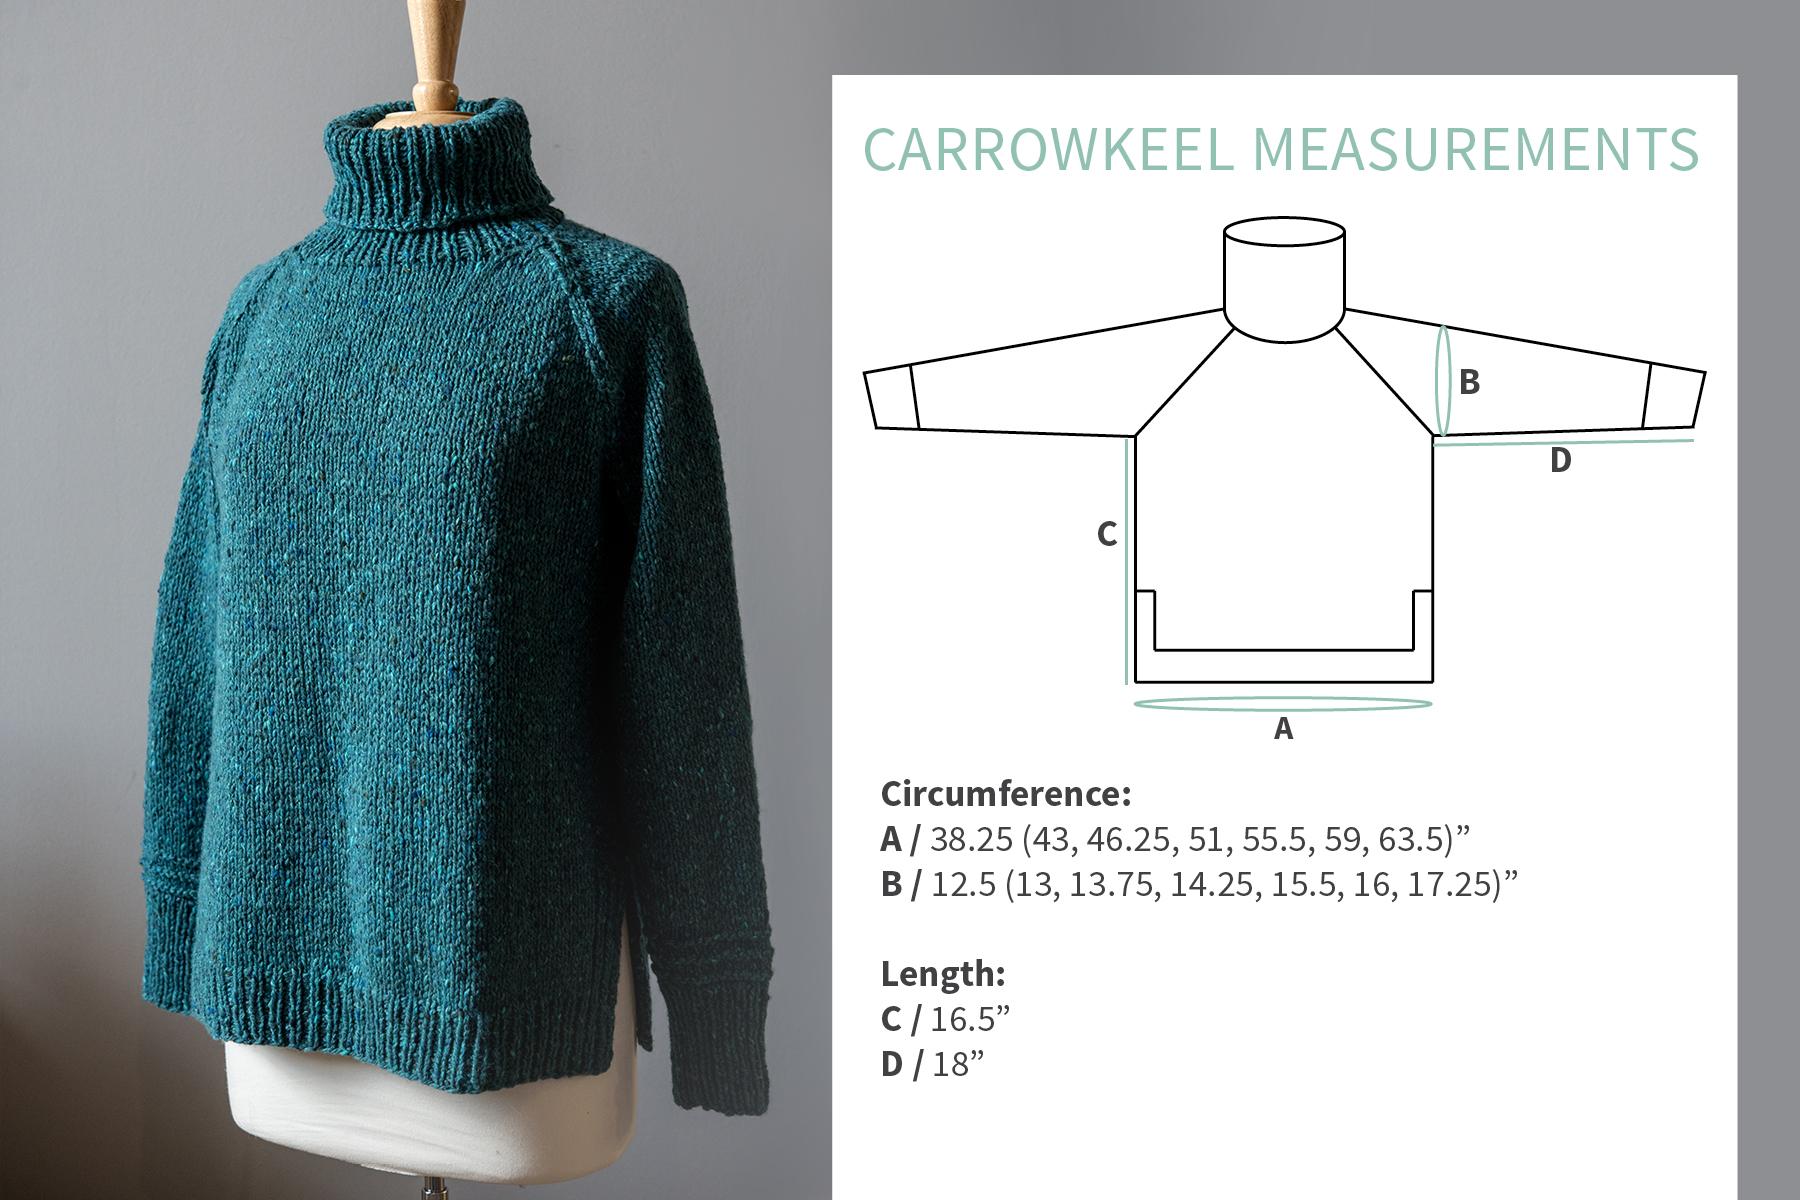 carrowkeel schematic.jpg